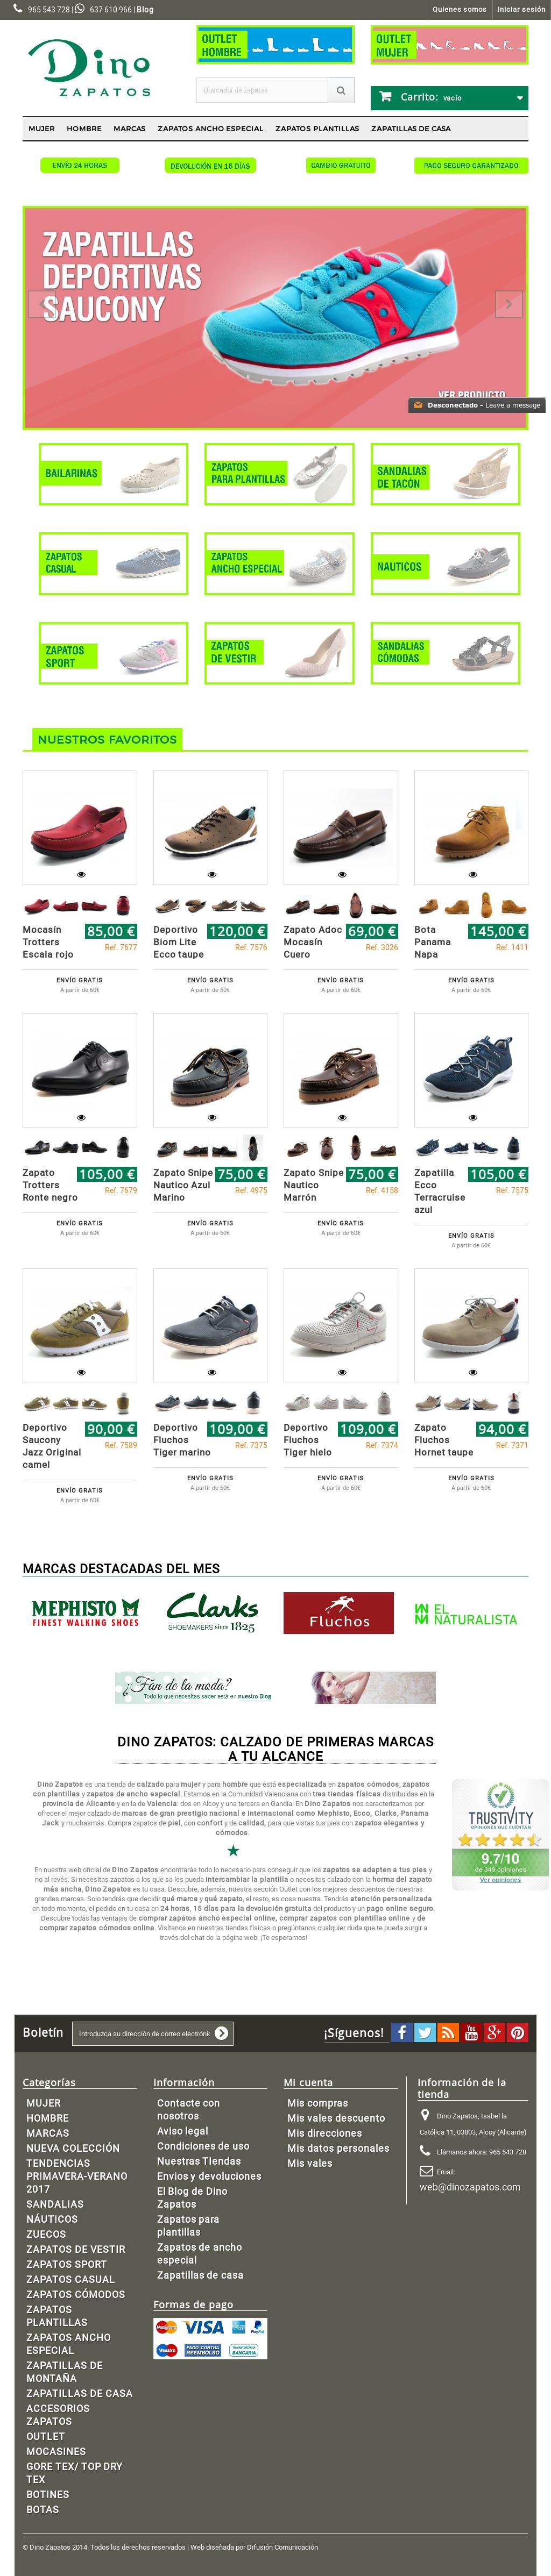 CompetitorsRevenue Owler Company Employees Zapatos Profile Dino And Qdtshr